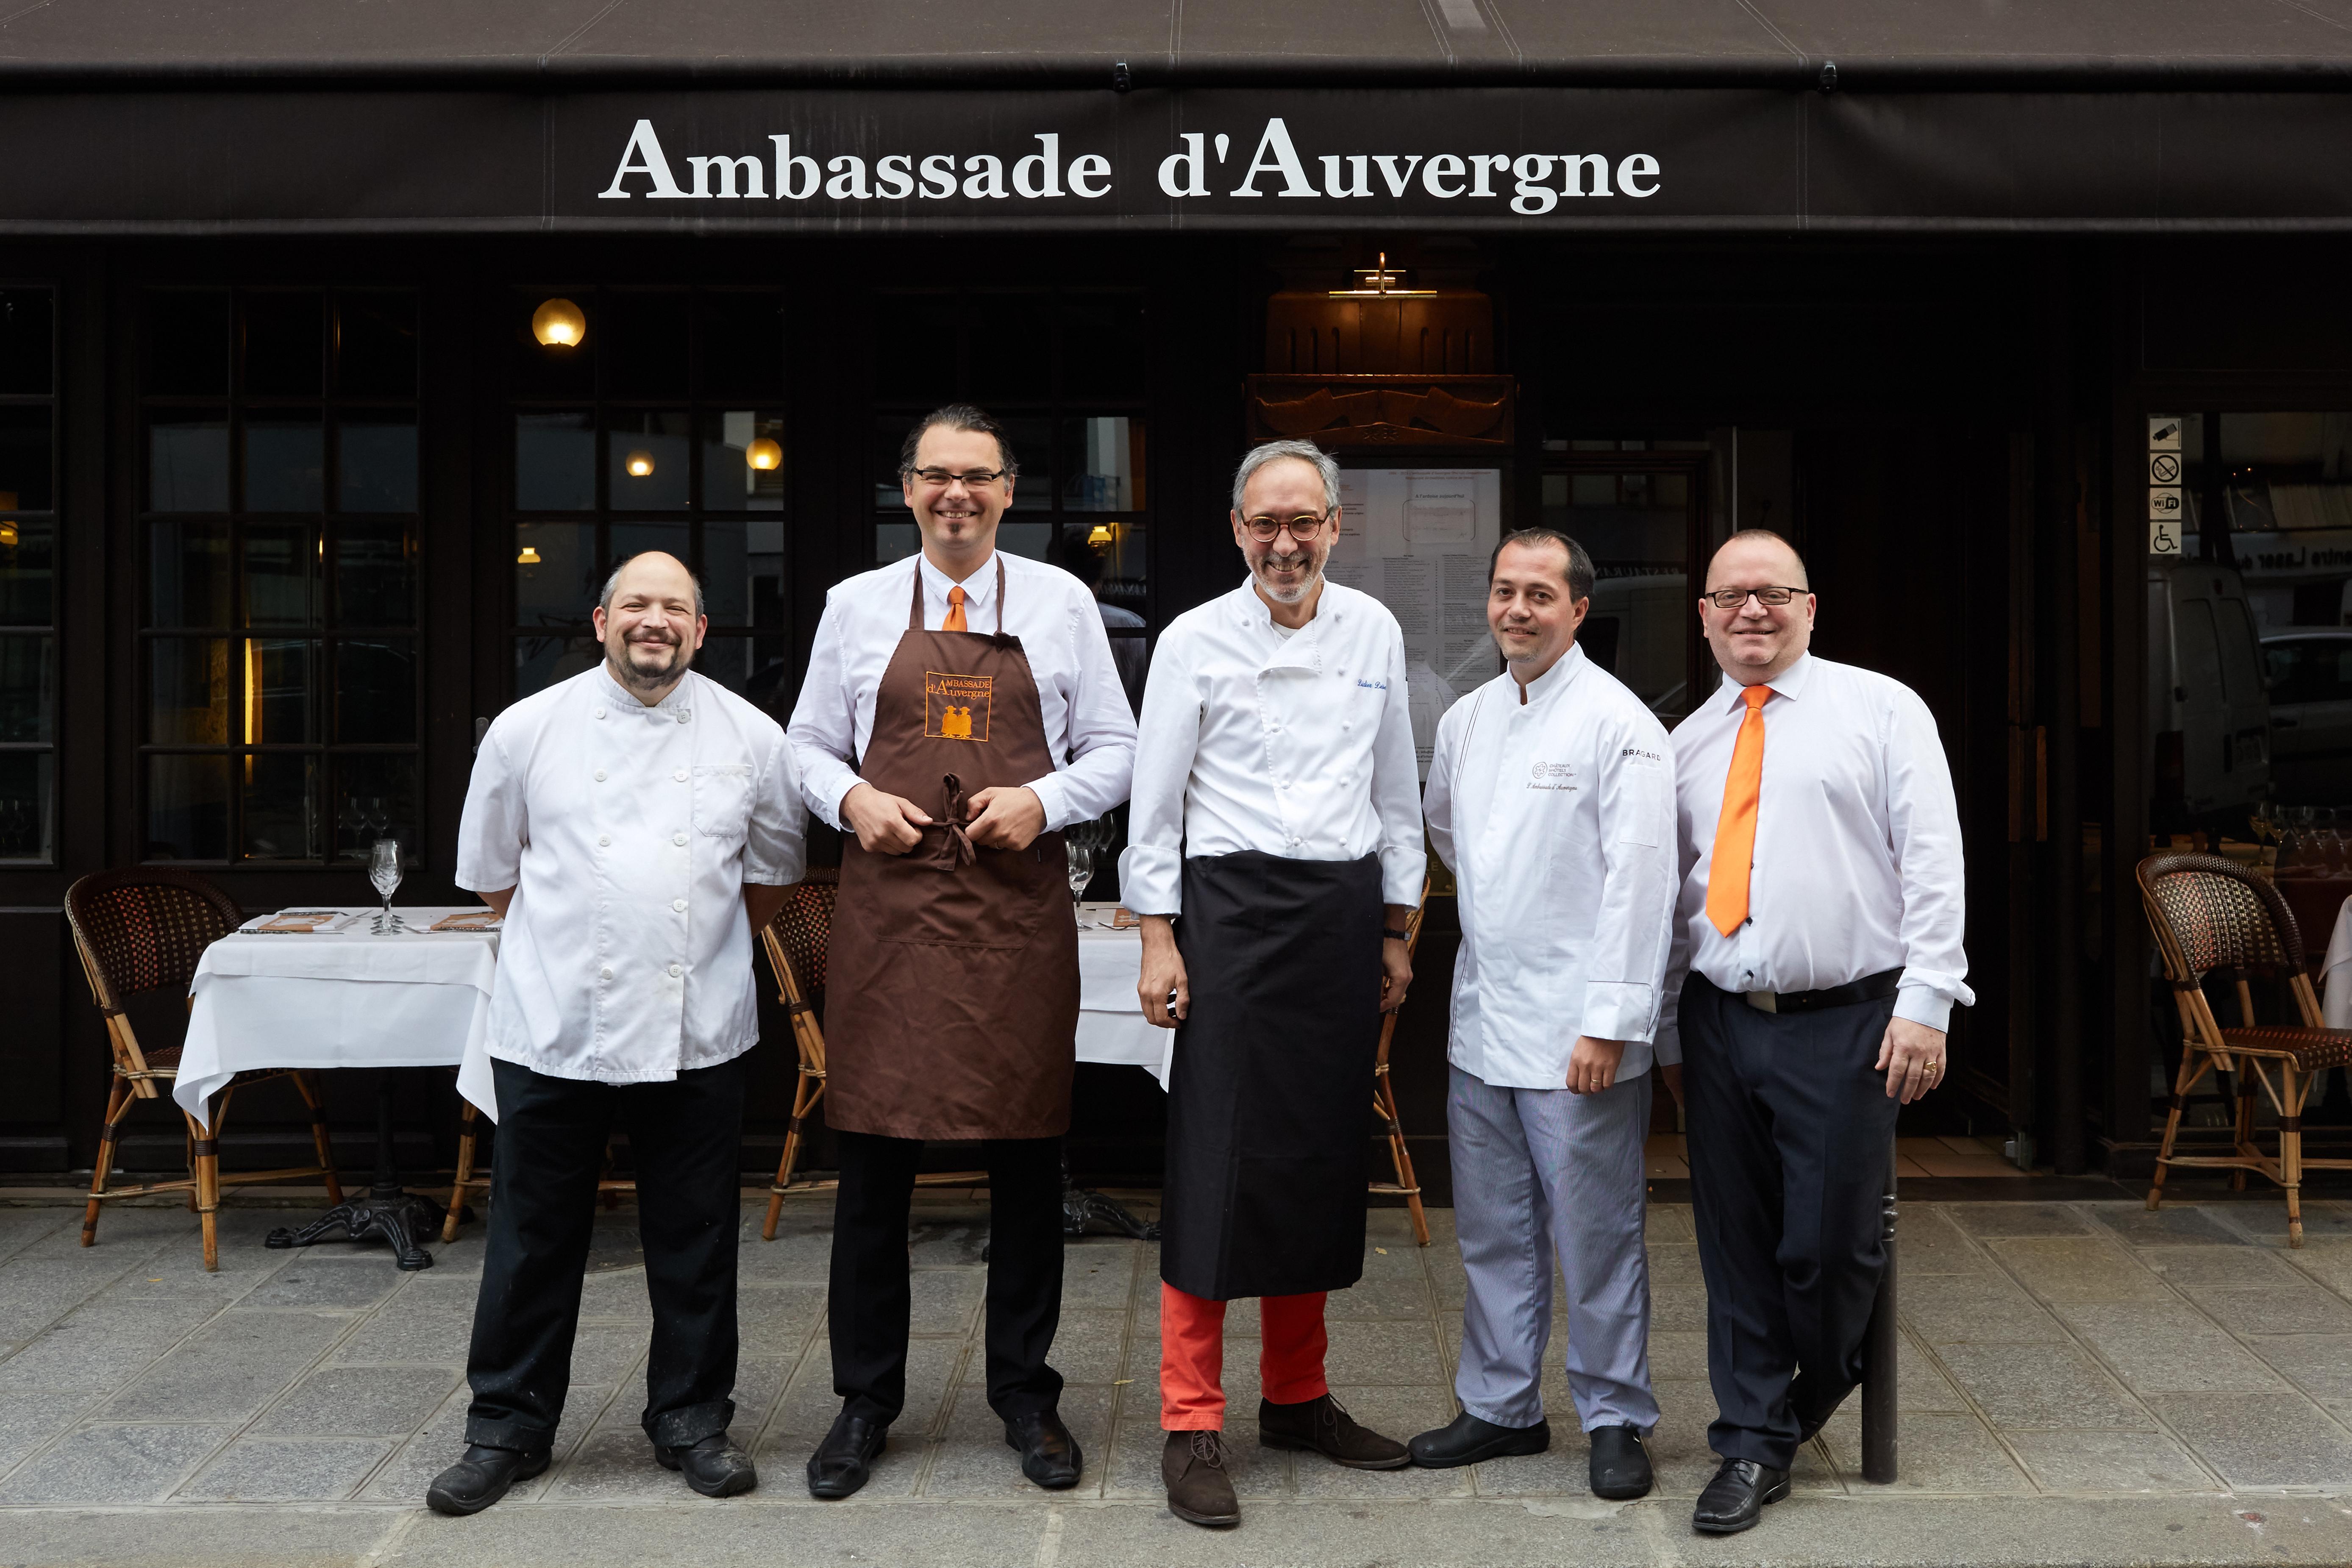 Adhérent L'AMBASSADE D'AUVERGNE - photo #8965